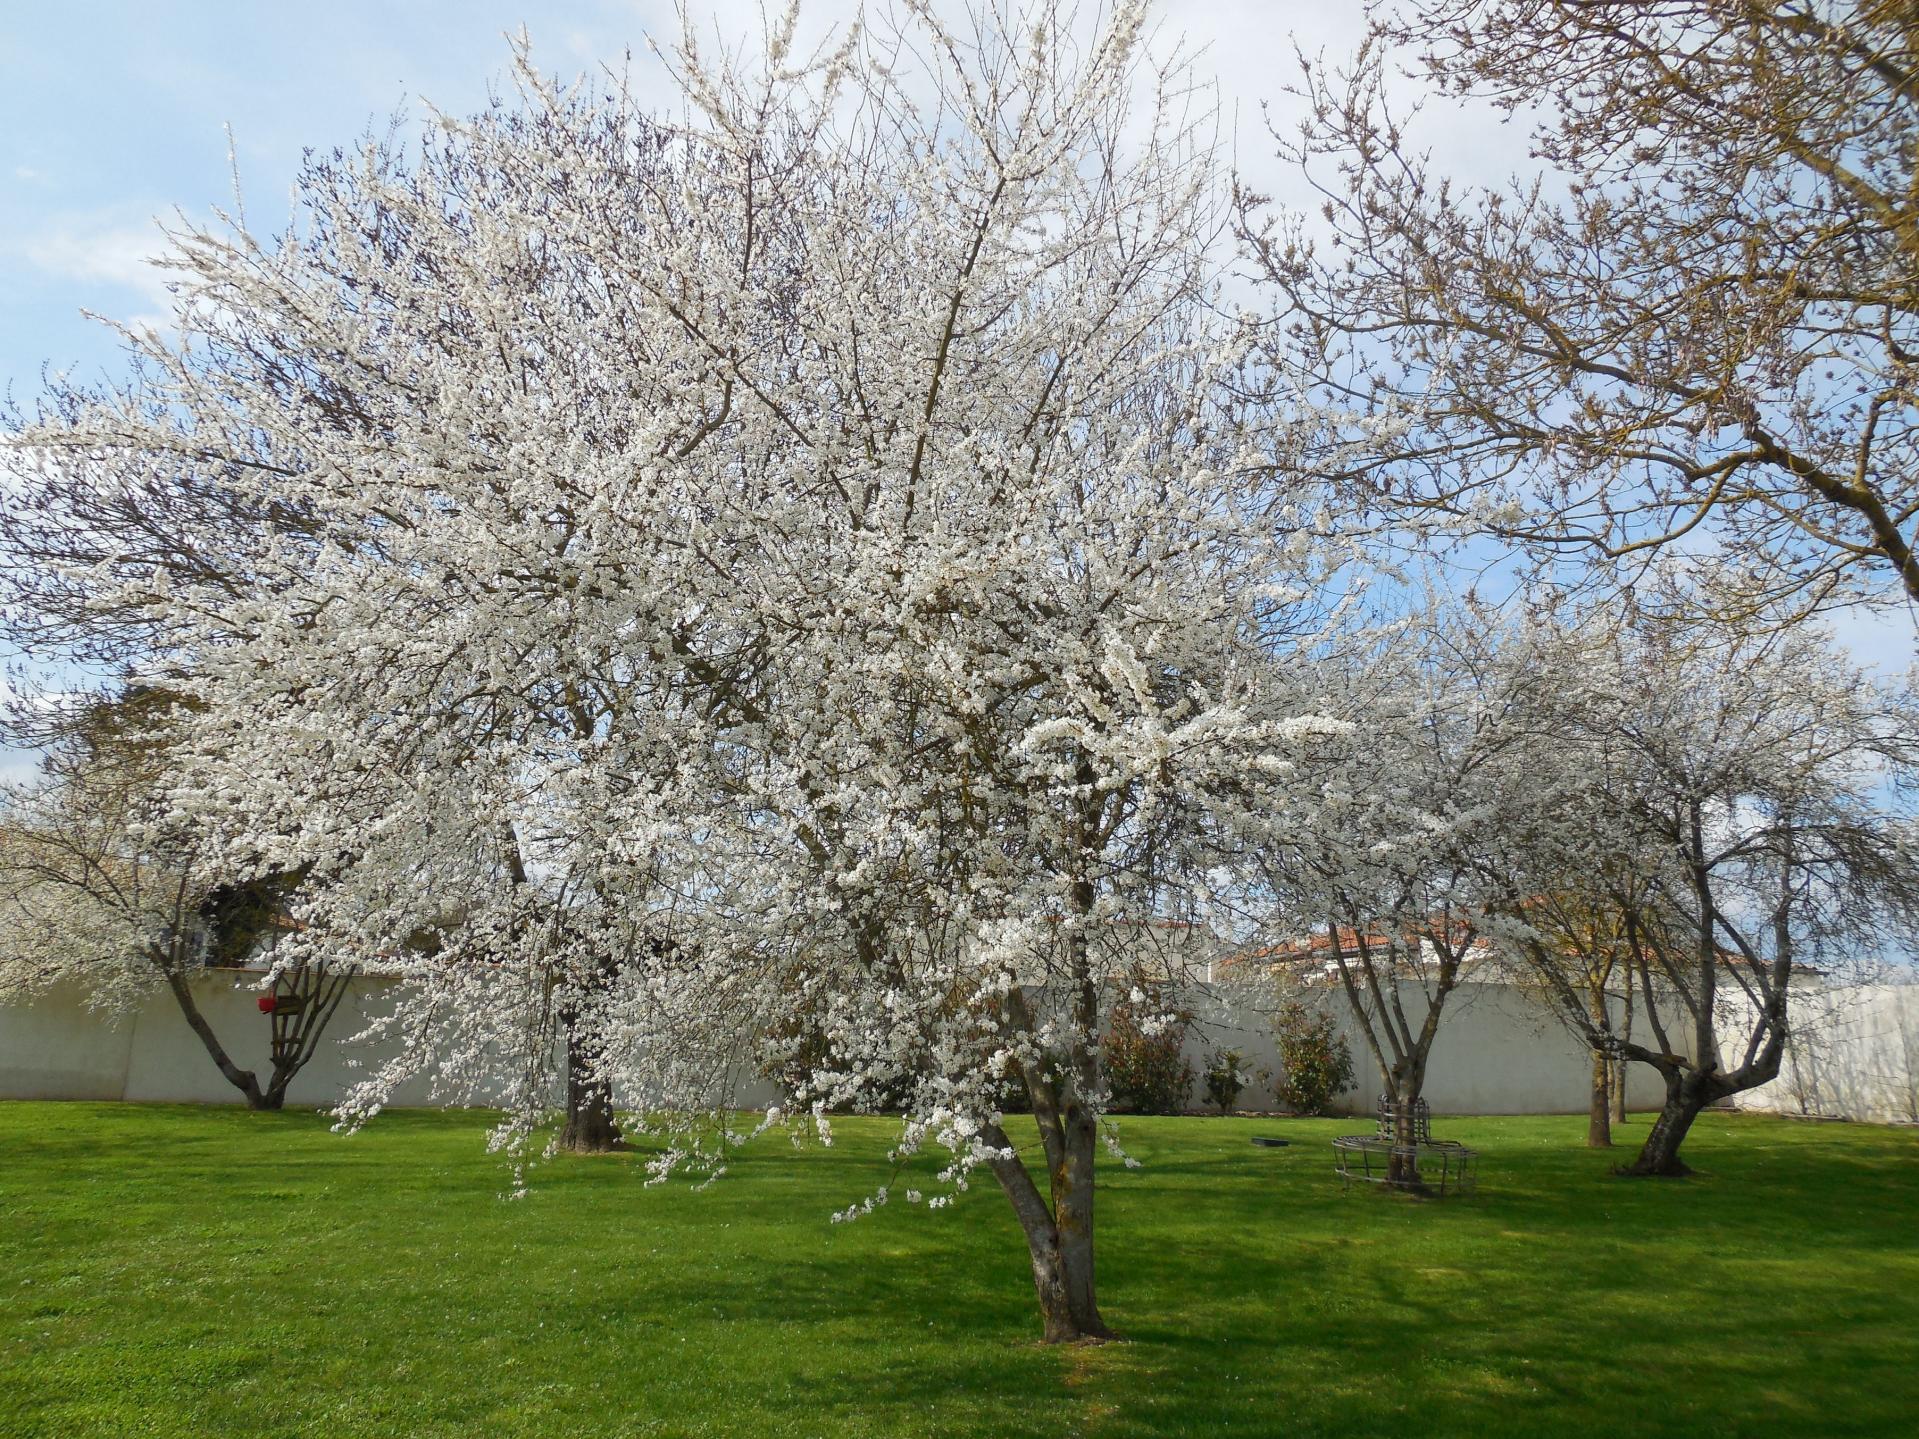 les pruniers en fleurs